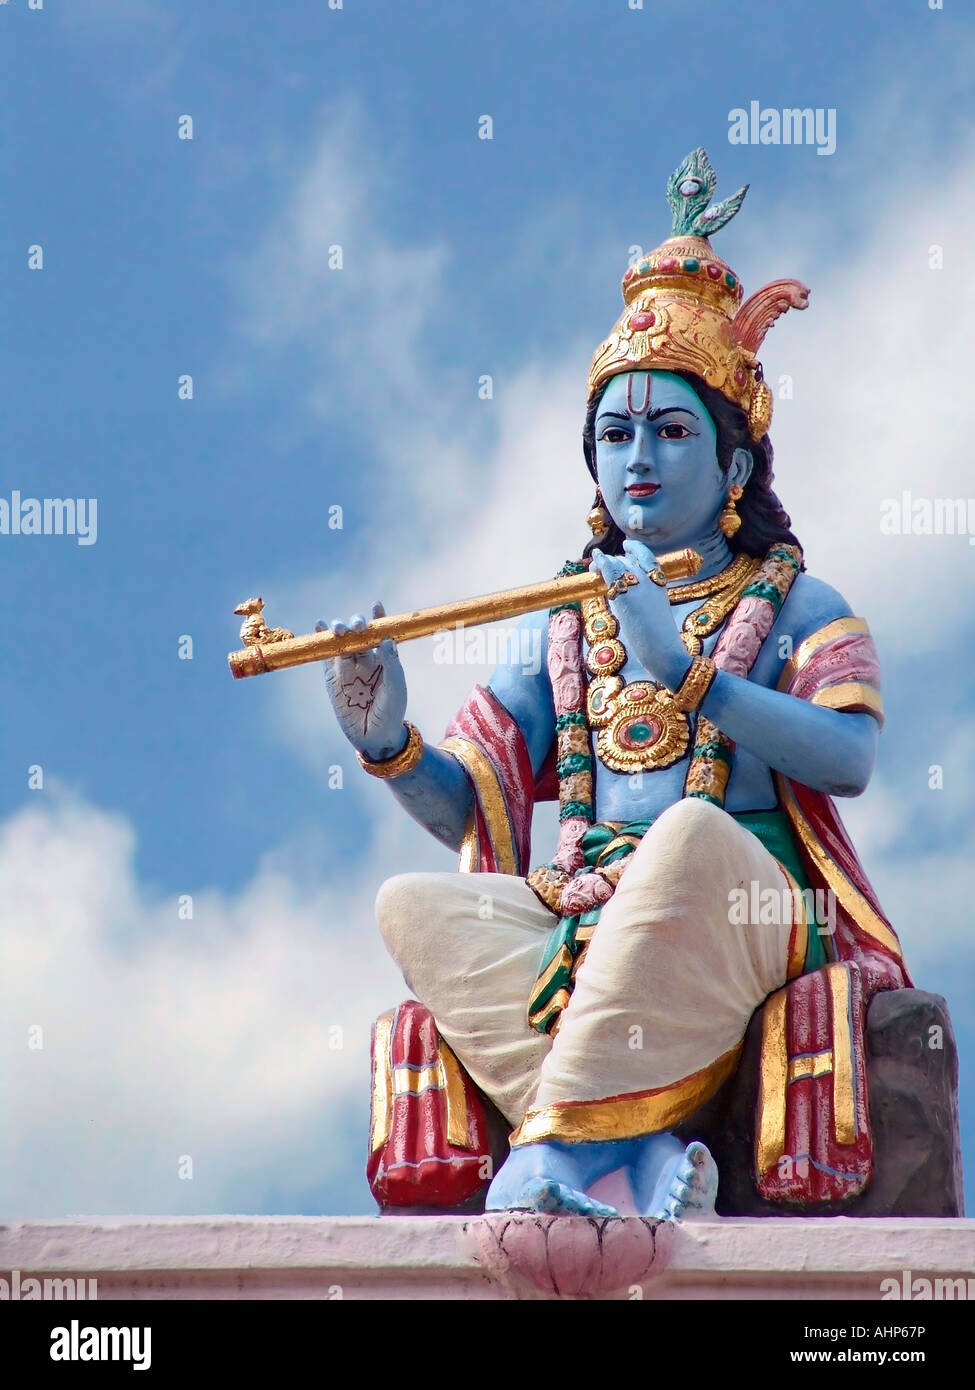 Stock Photo of Hindu God Lord Krishna - Stock Image